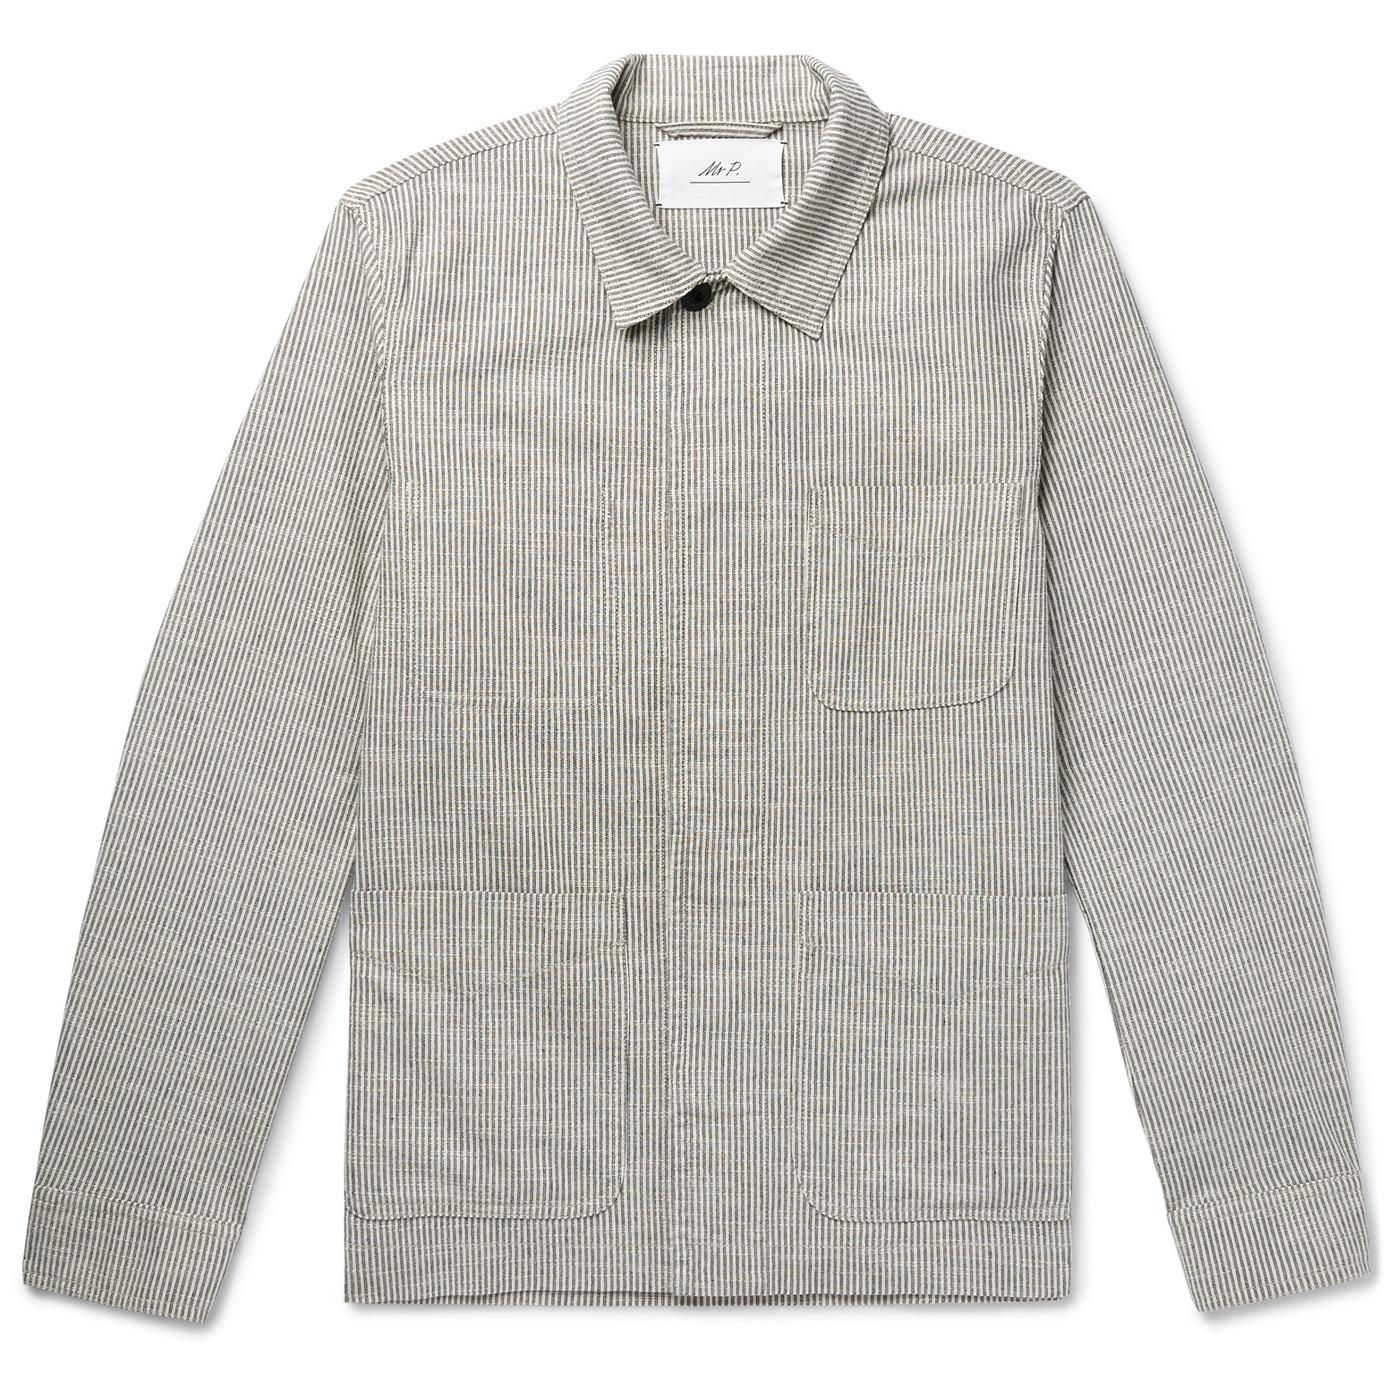 Style Mr Porter Veste Mr P. Chore Jacket Grise Rayée